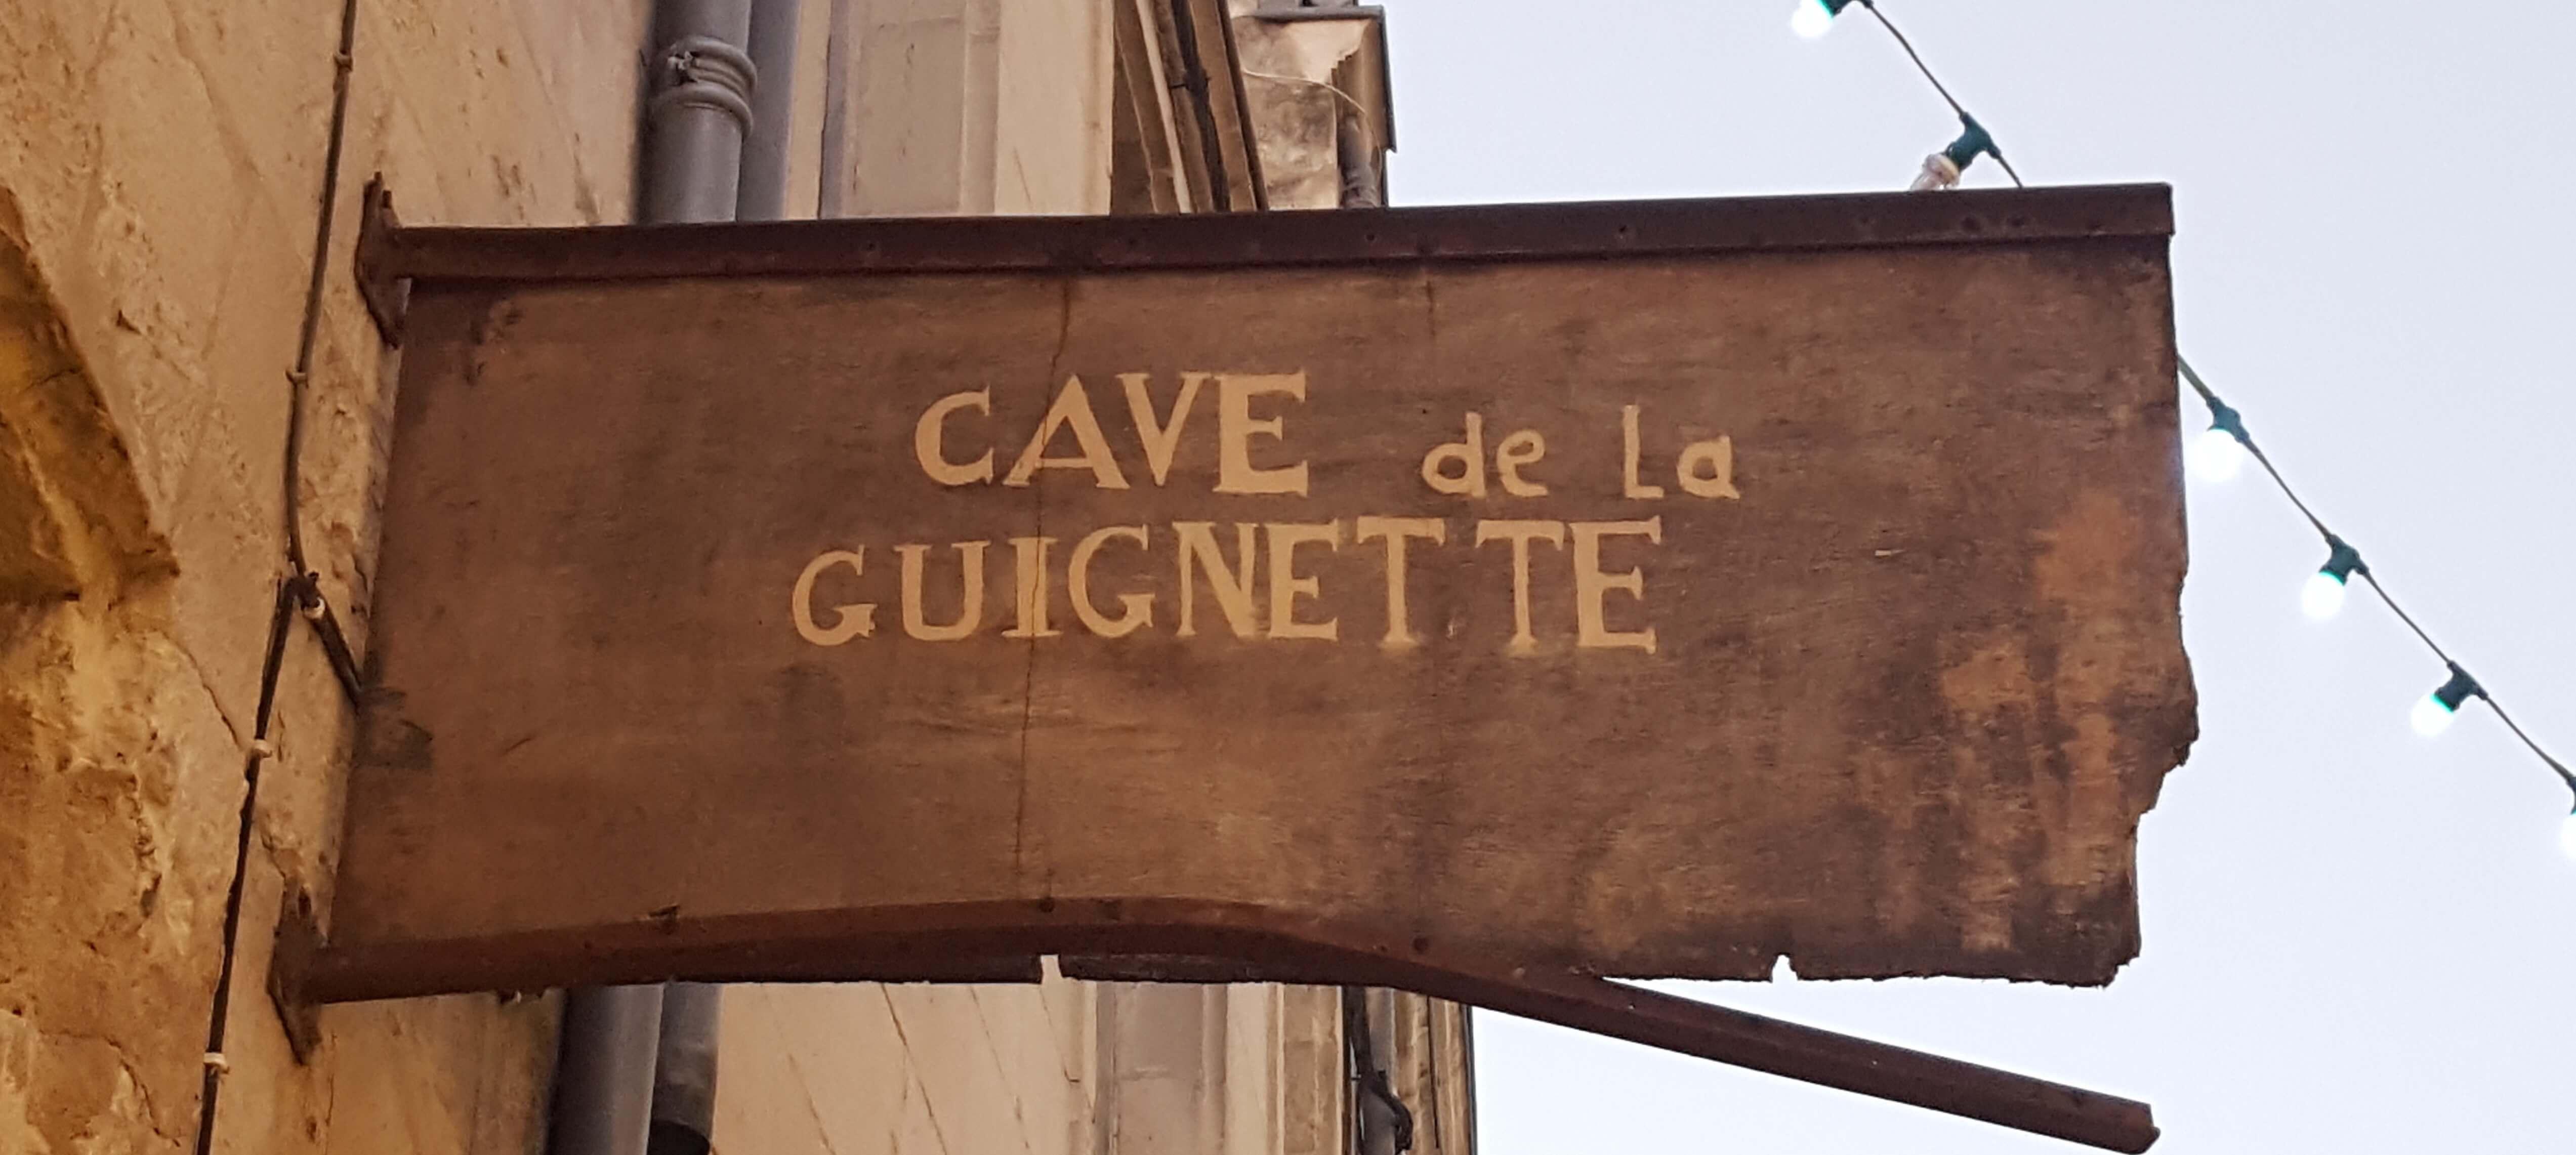 guignette